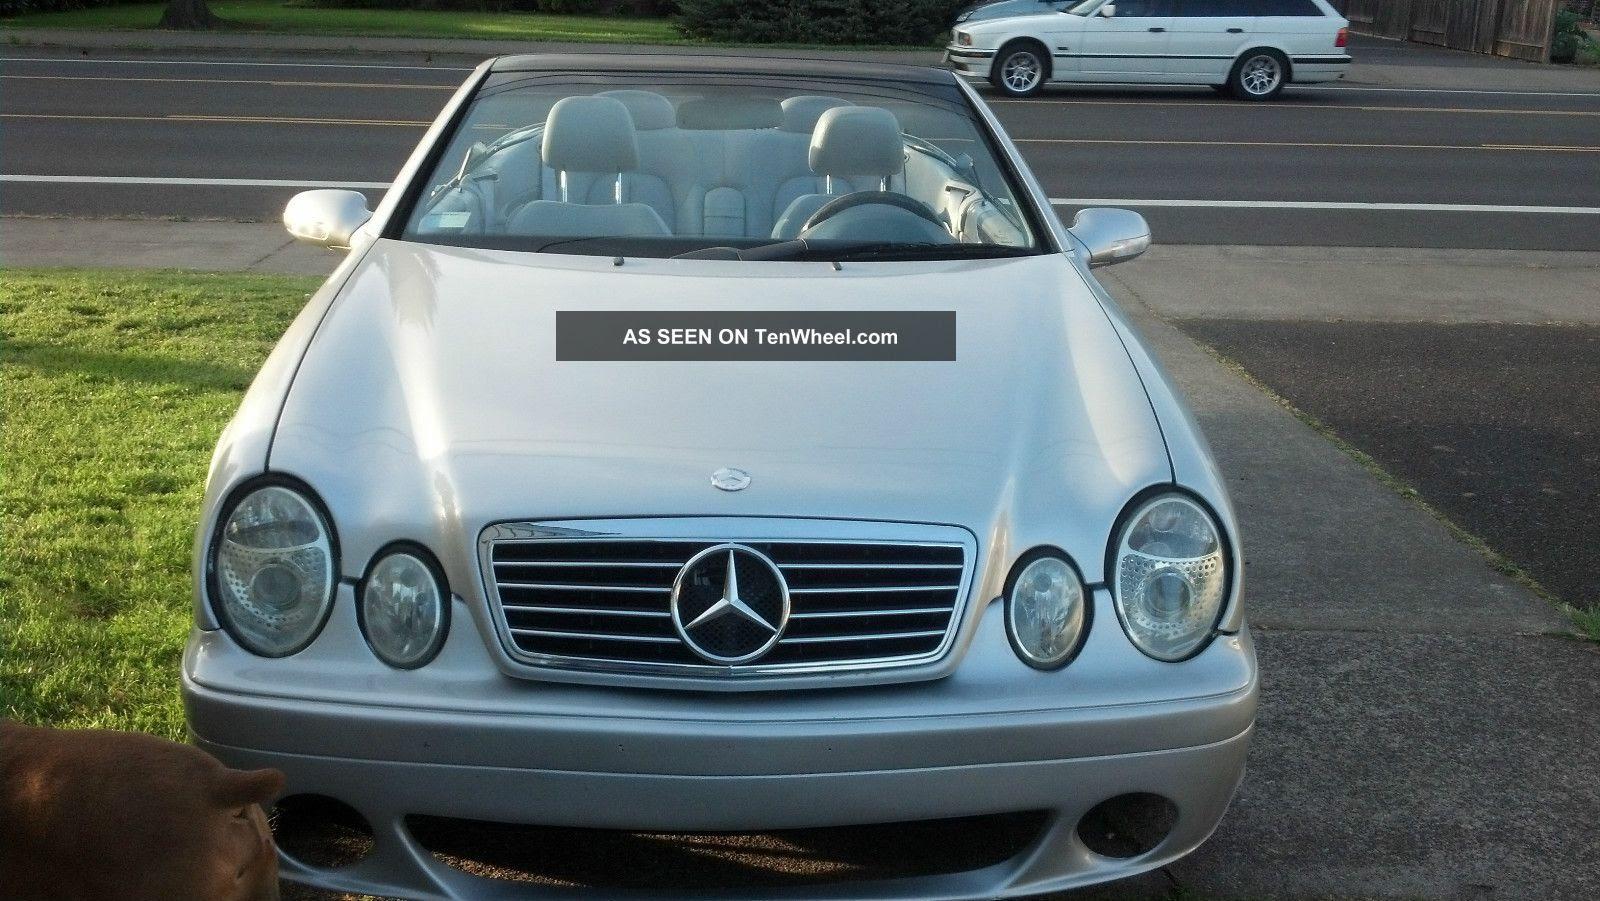 2000 Mercedes - Benz Clk 430 Convertible